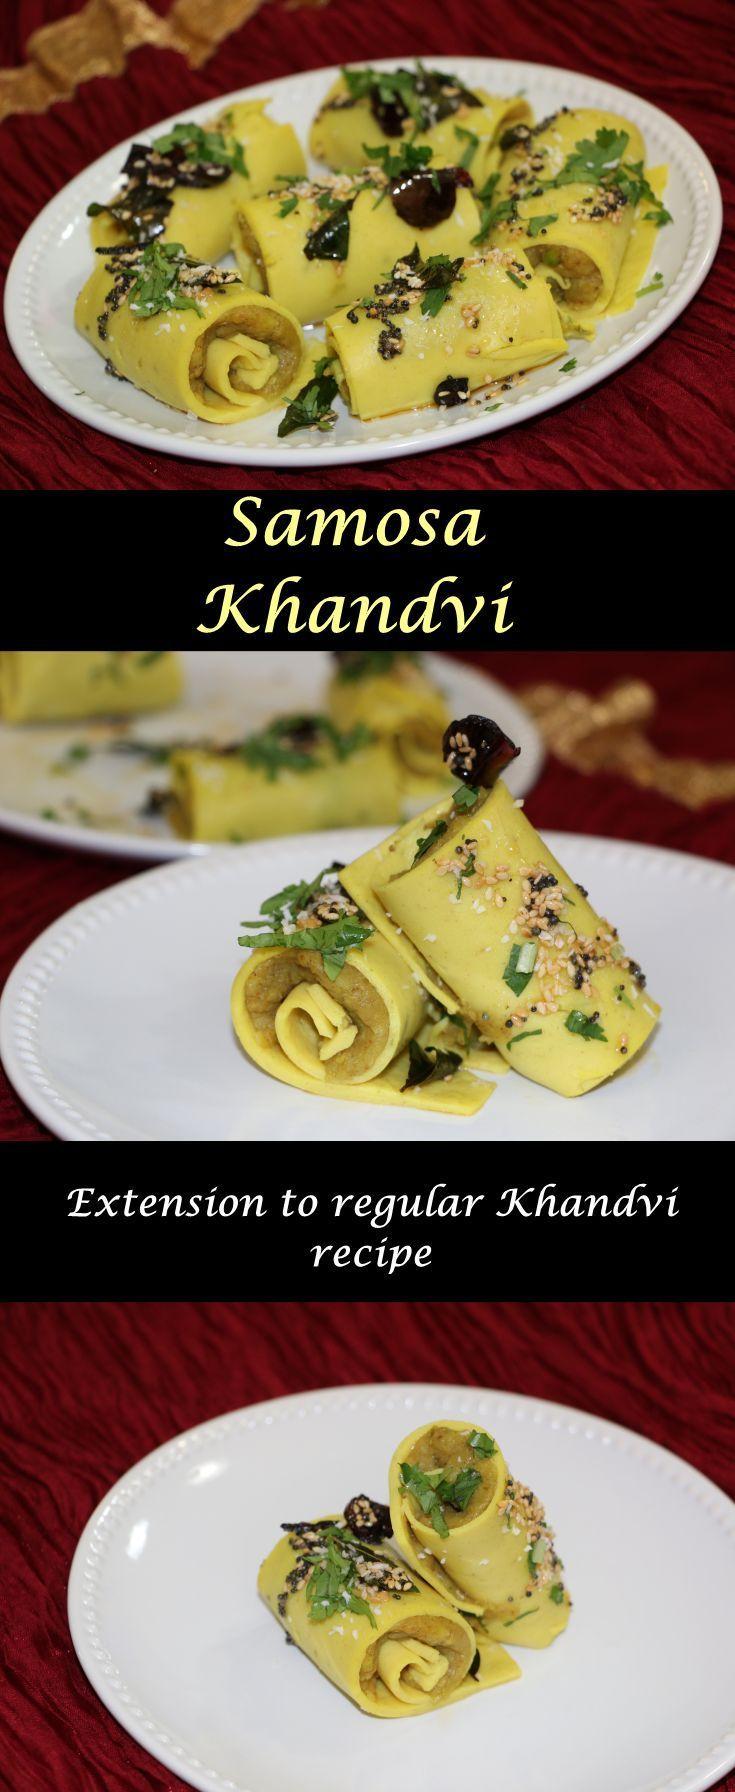 Samosa khandvi cookingcarnival rolls snacks and dishes samosa khandvi cookingcarnival indian food recipesall forumfinder Choice Image